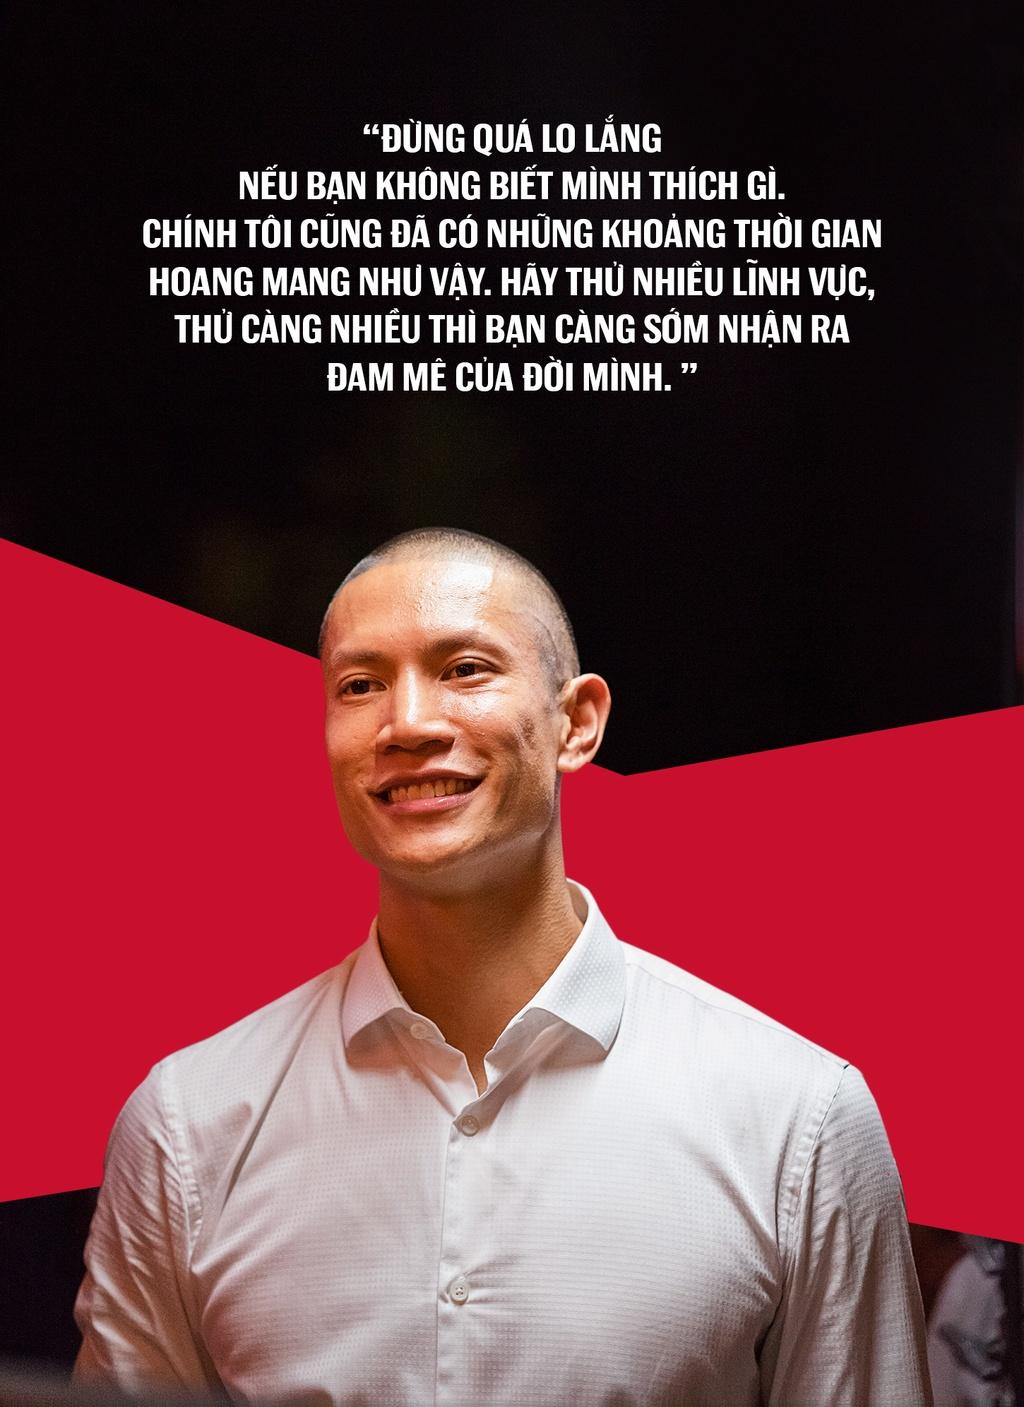 TK Nguyen - chu nhan dien trai cua skybar cao nhat Nha Trang hinh anh 2